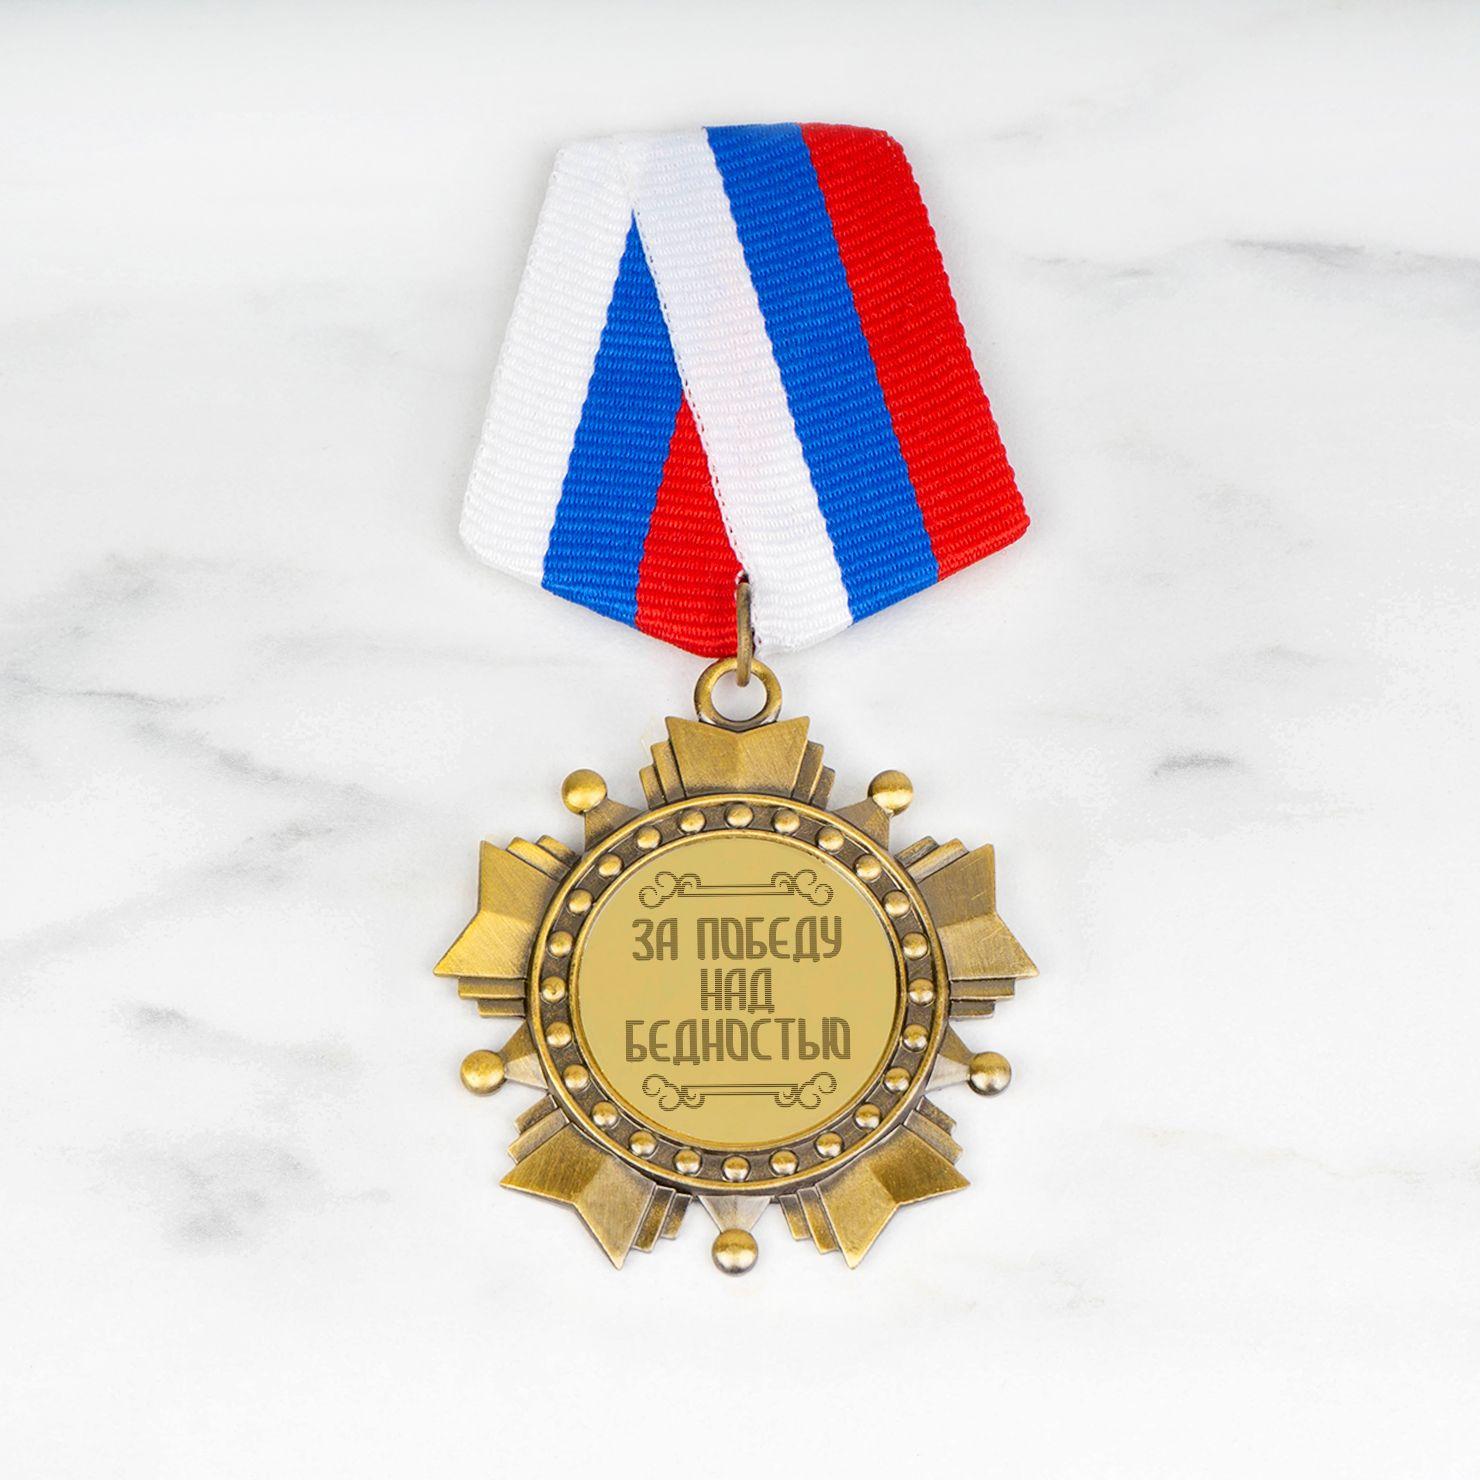 Орден *За победу над бедностью*